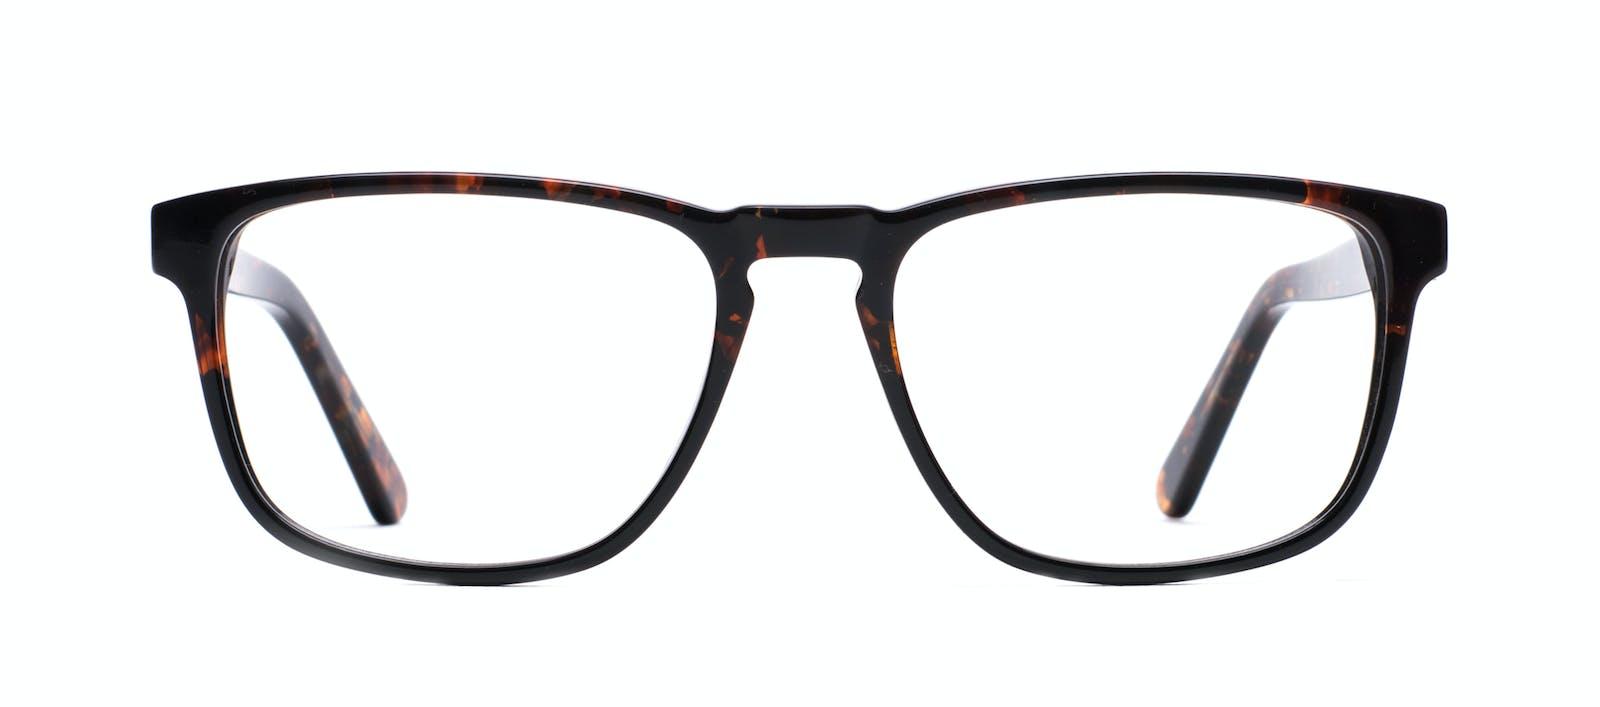 5708232463a Affordable Fashion Glasses Rectangle Eyeglasses Men Loft Mahogany Black  Front